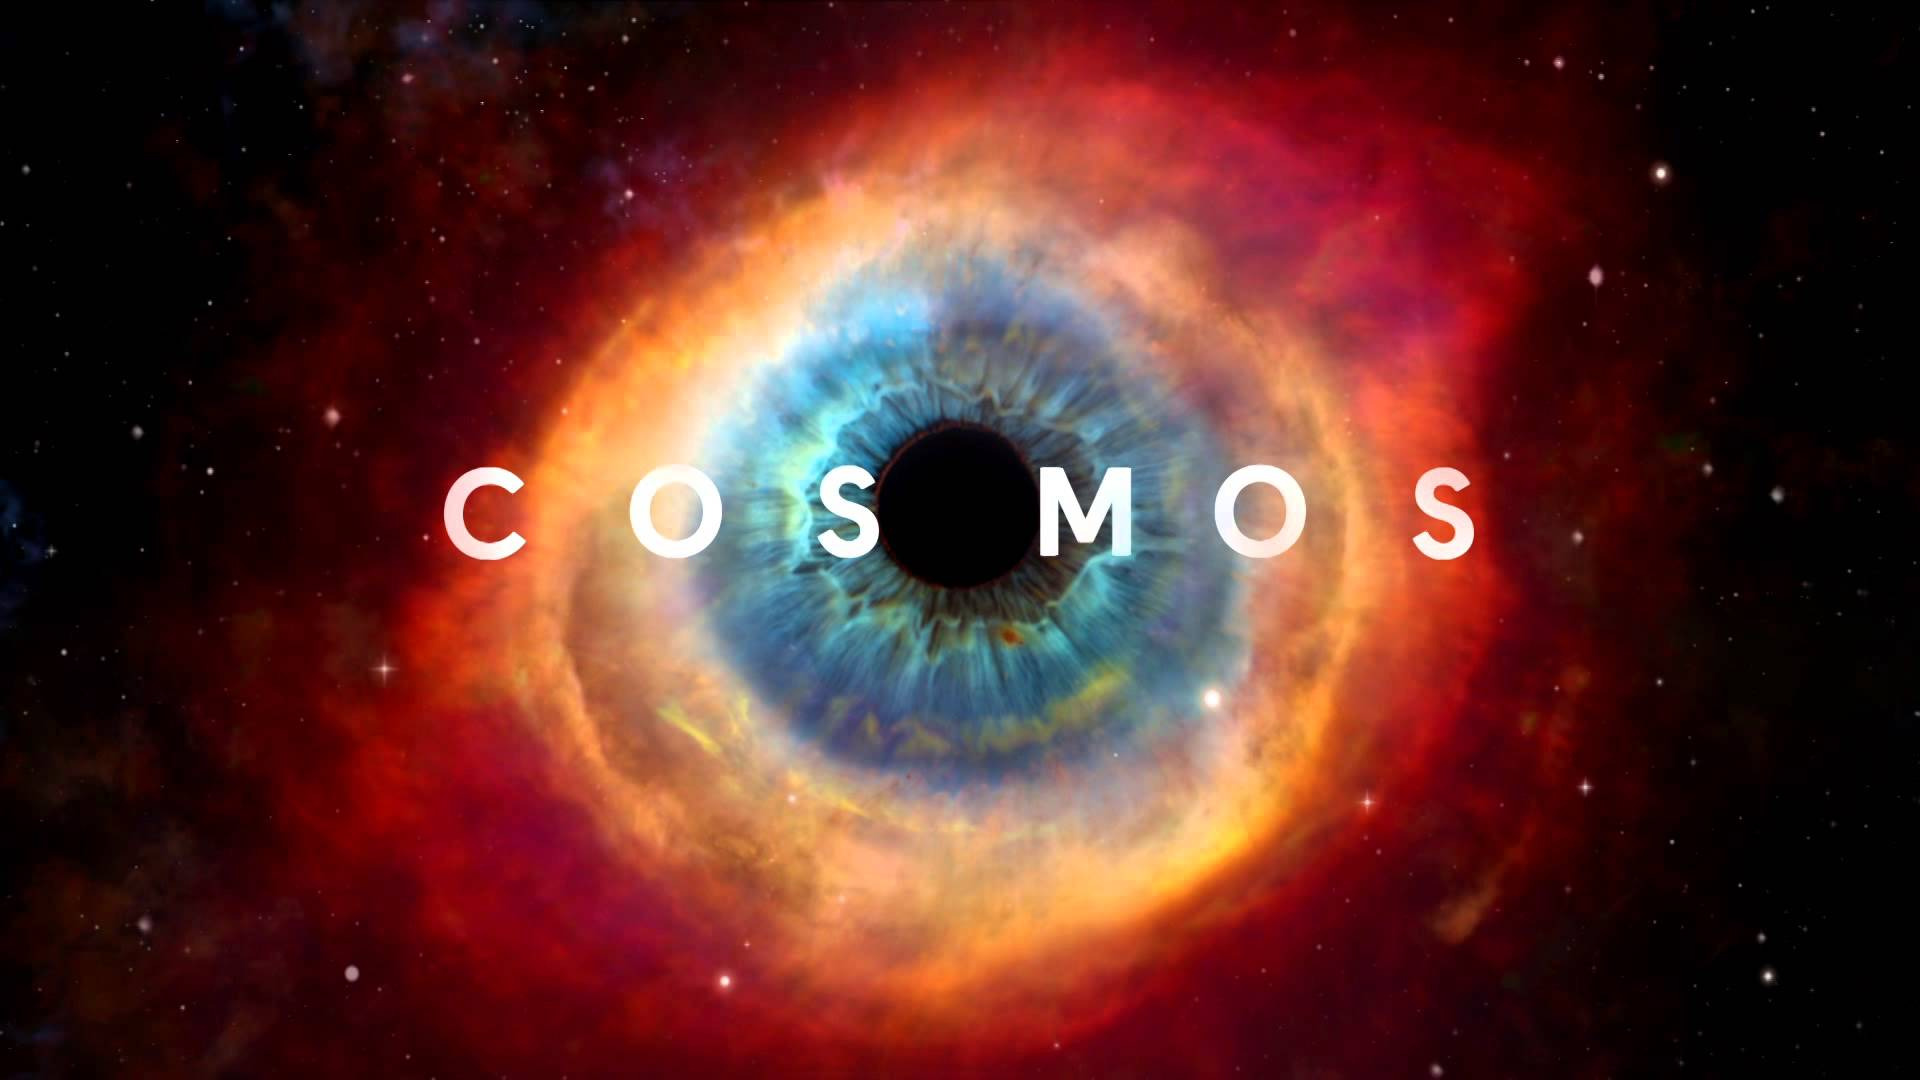 Show Cosmos